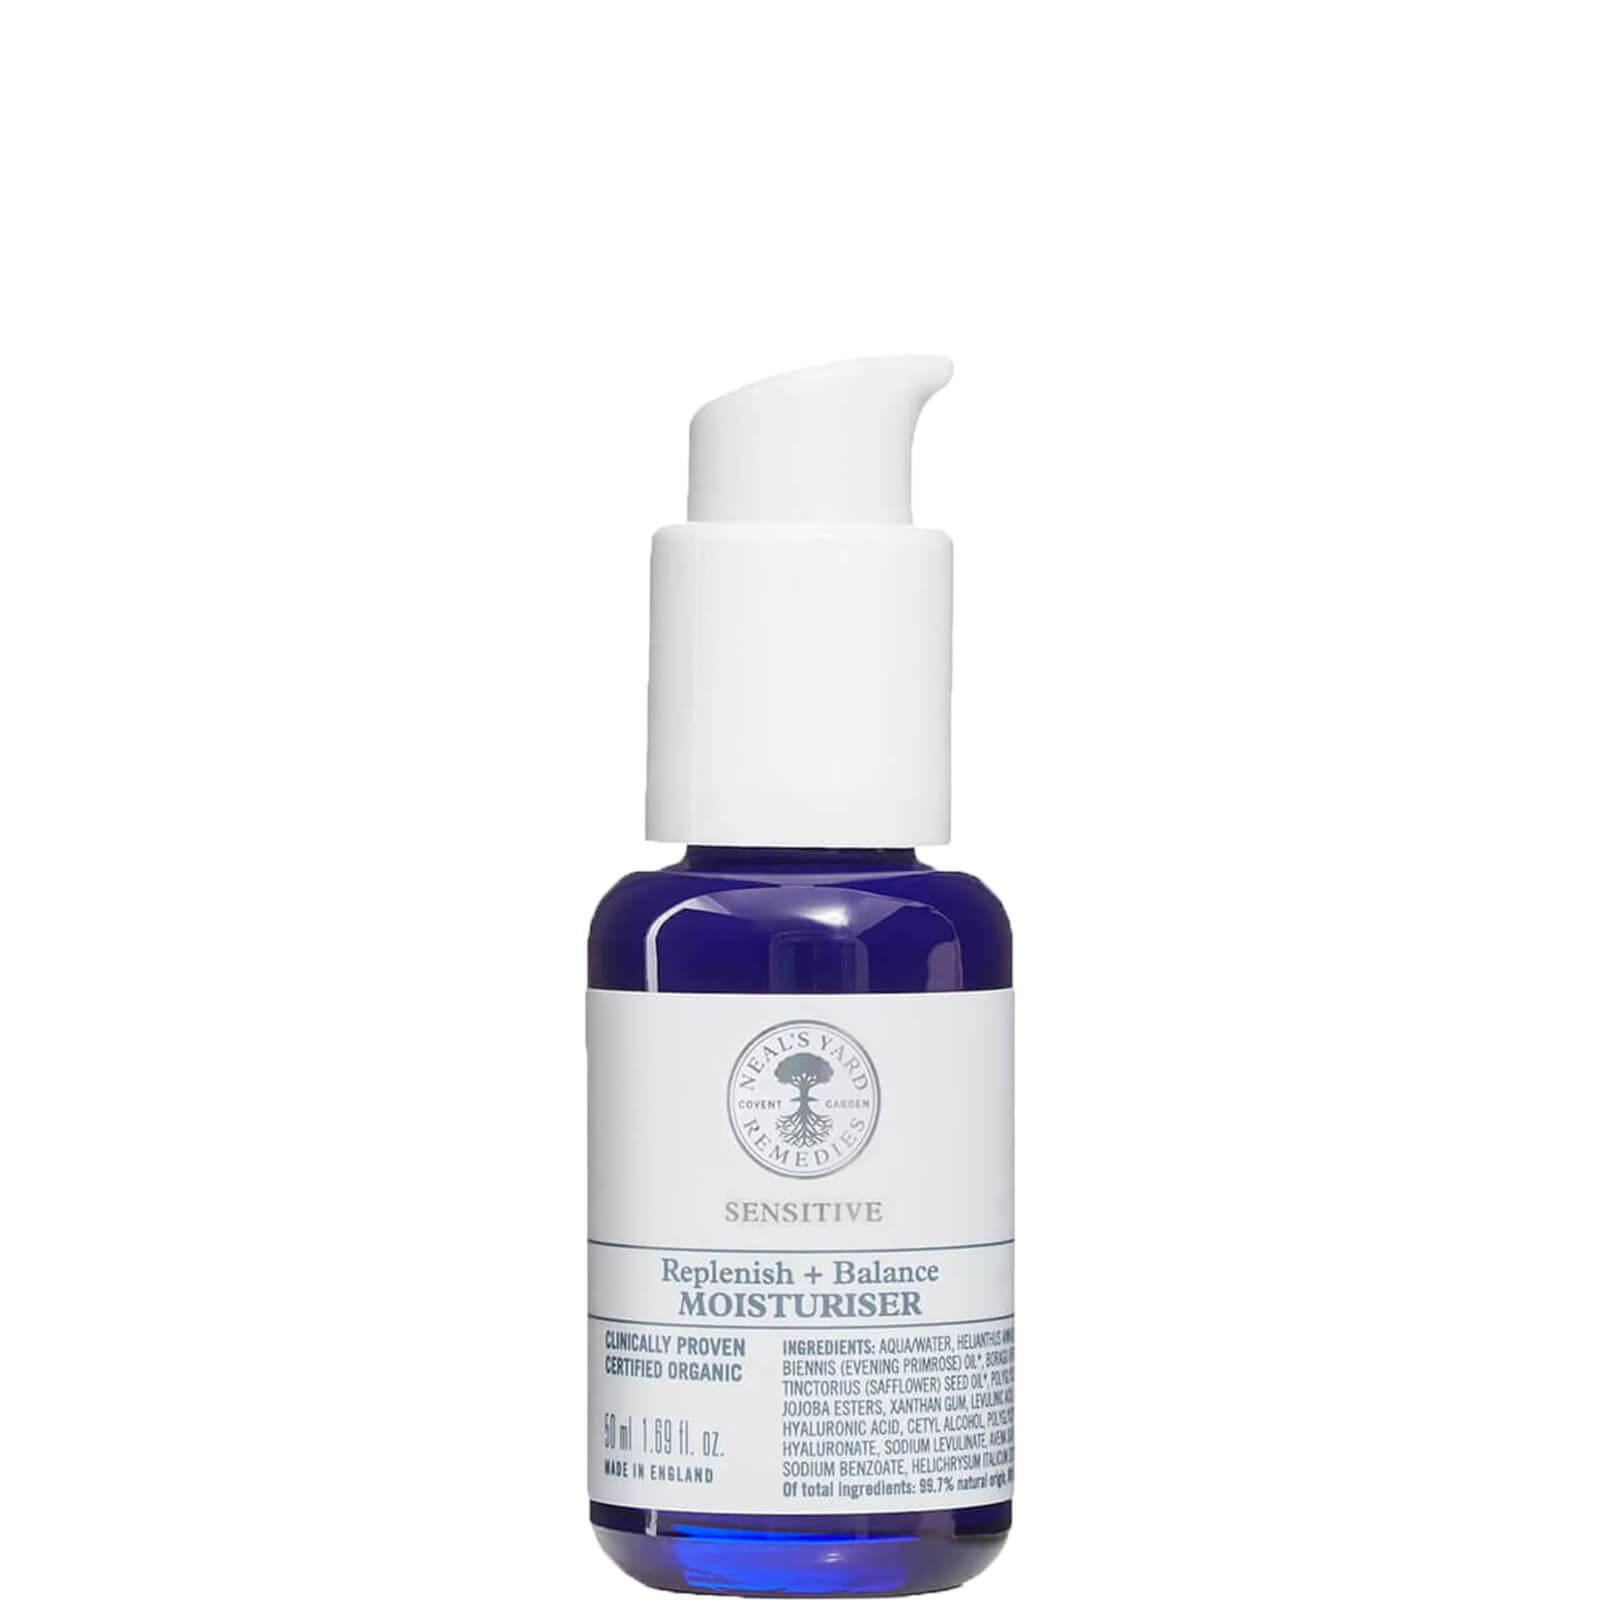 Sensitive Replenish + Balance Moisturizer 50ml